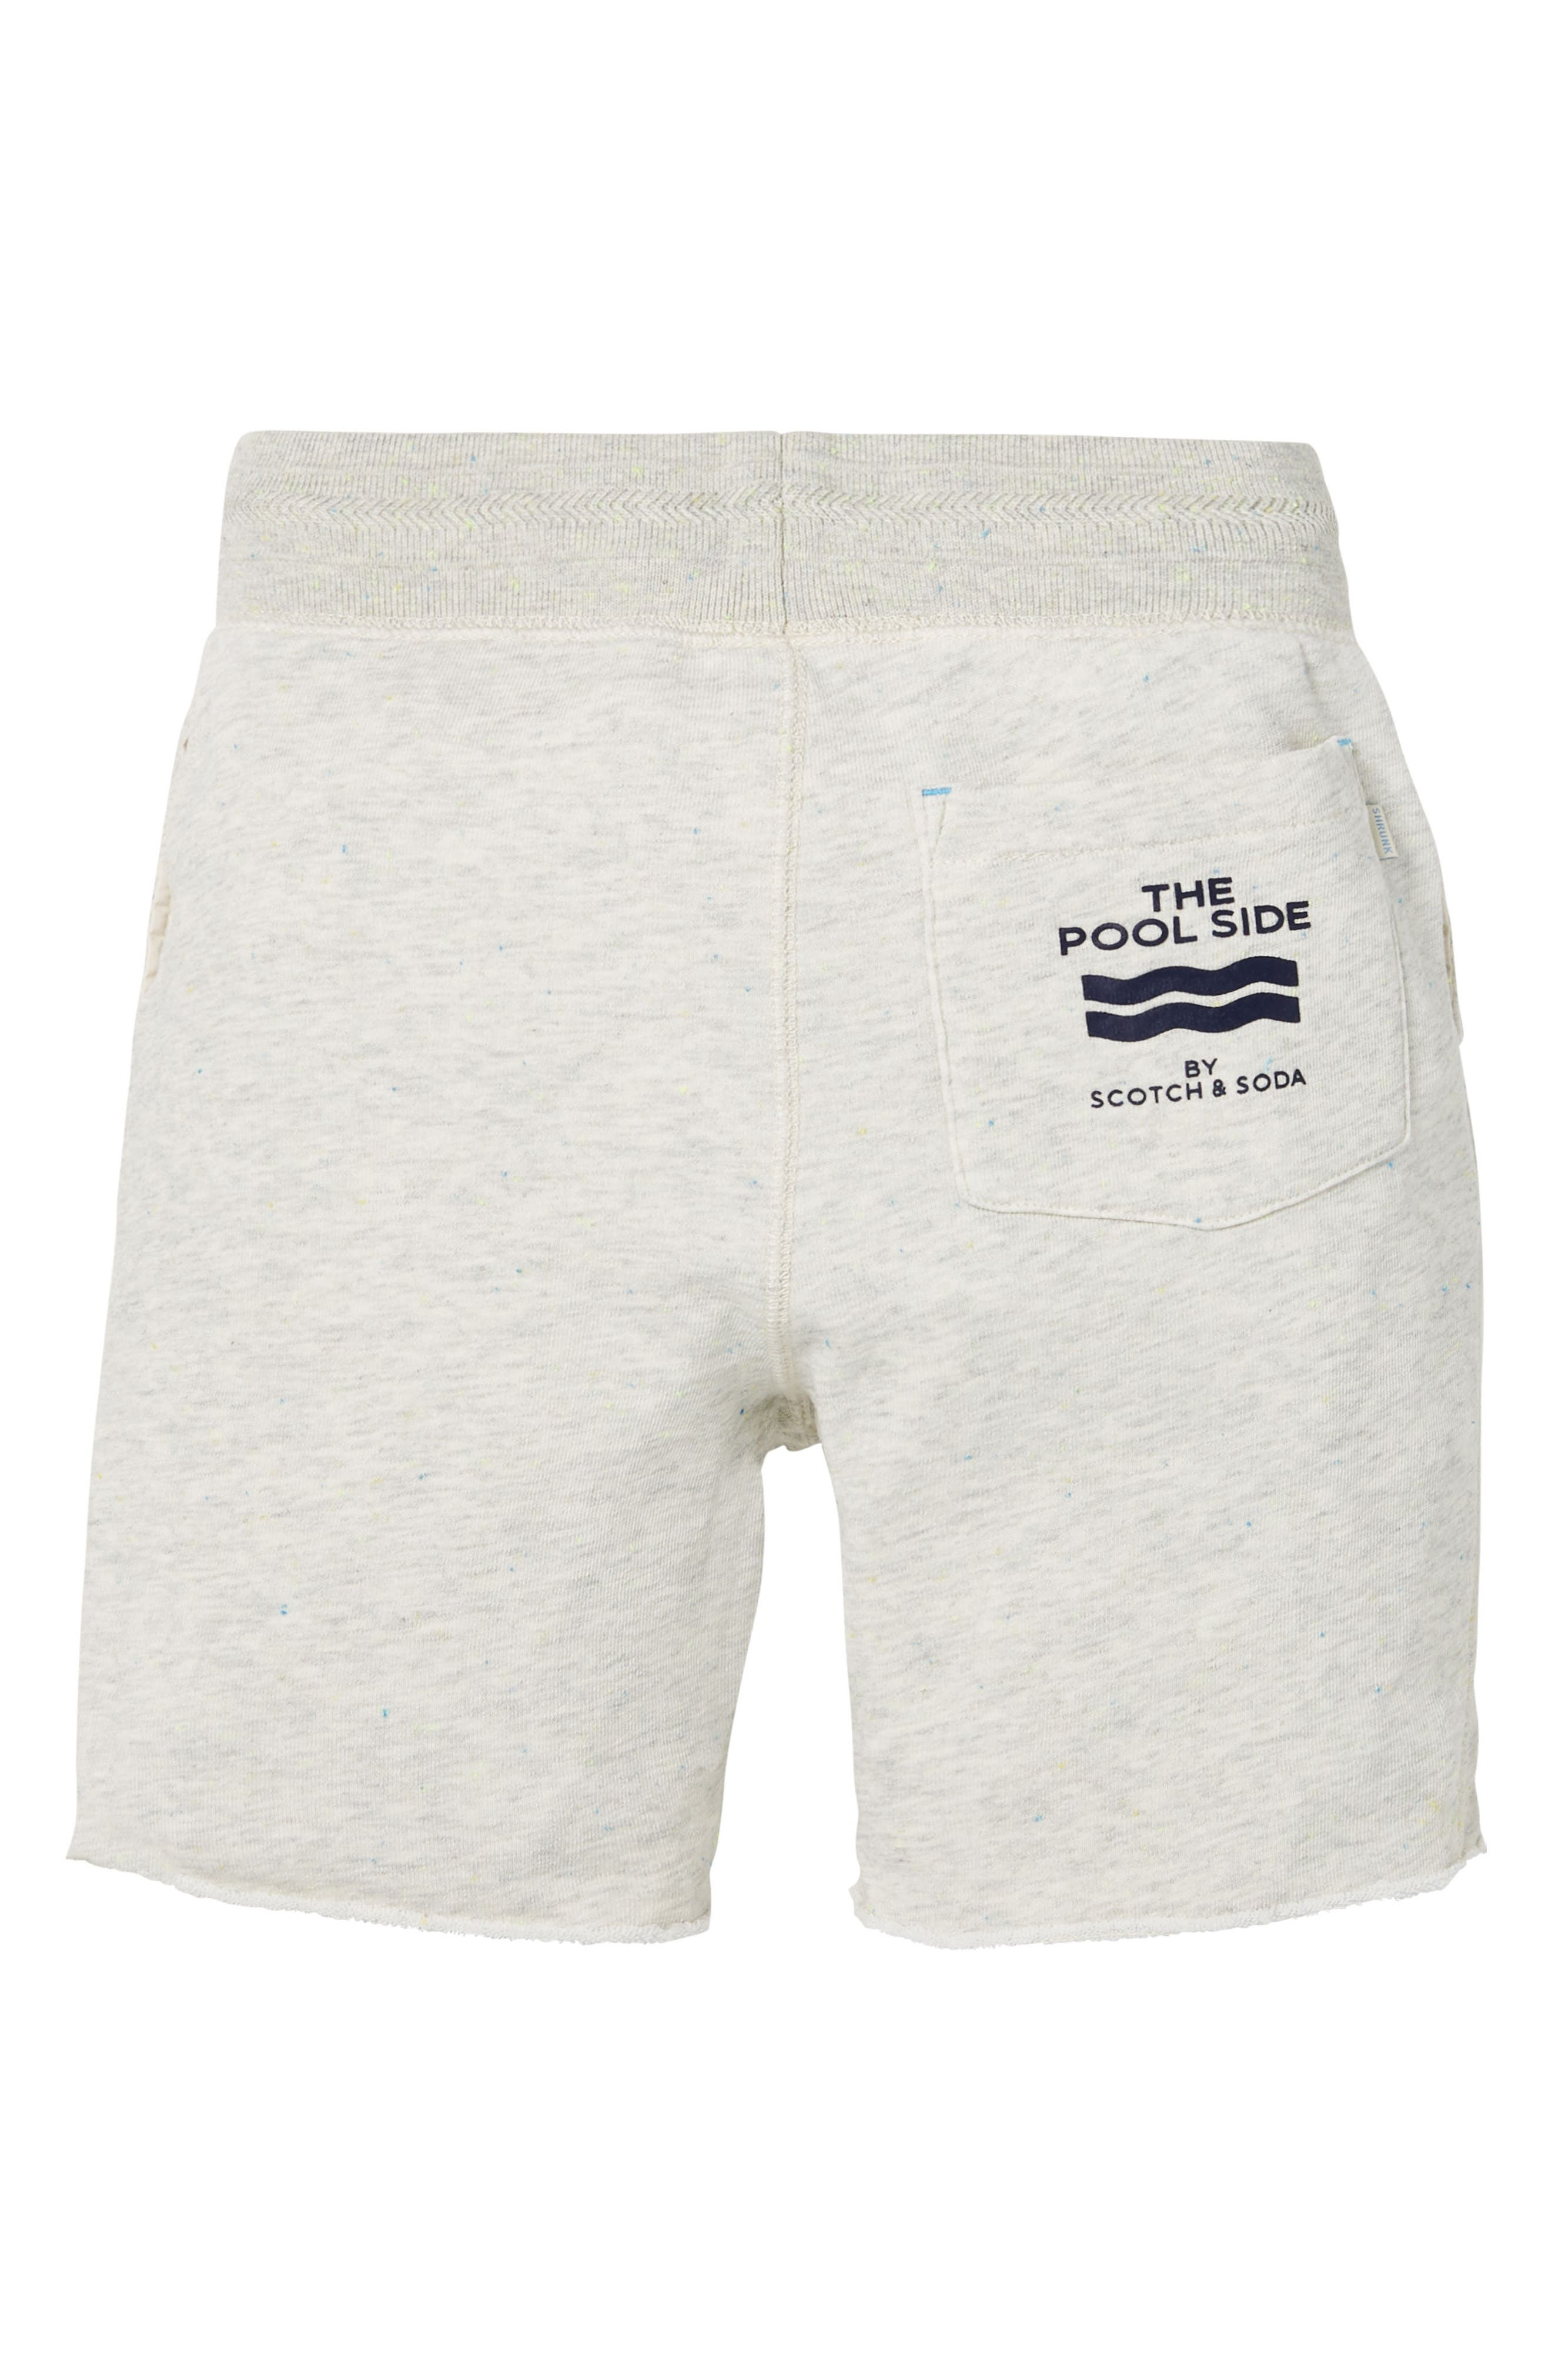 Pool Side Knit Shorts,                             Alternate thumbnail 2, color,                             900